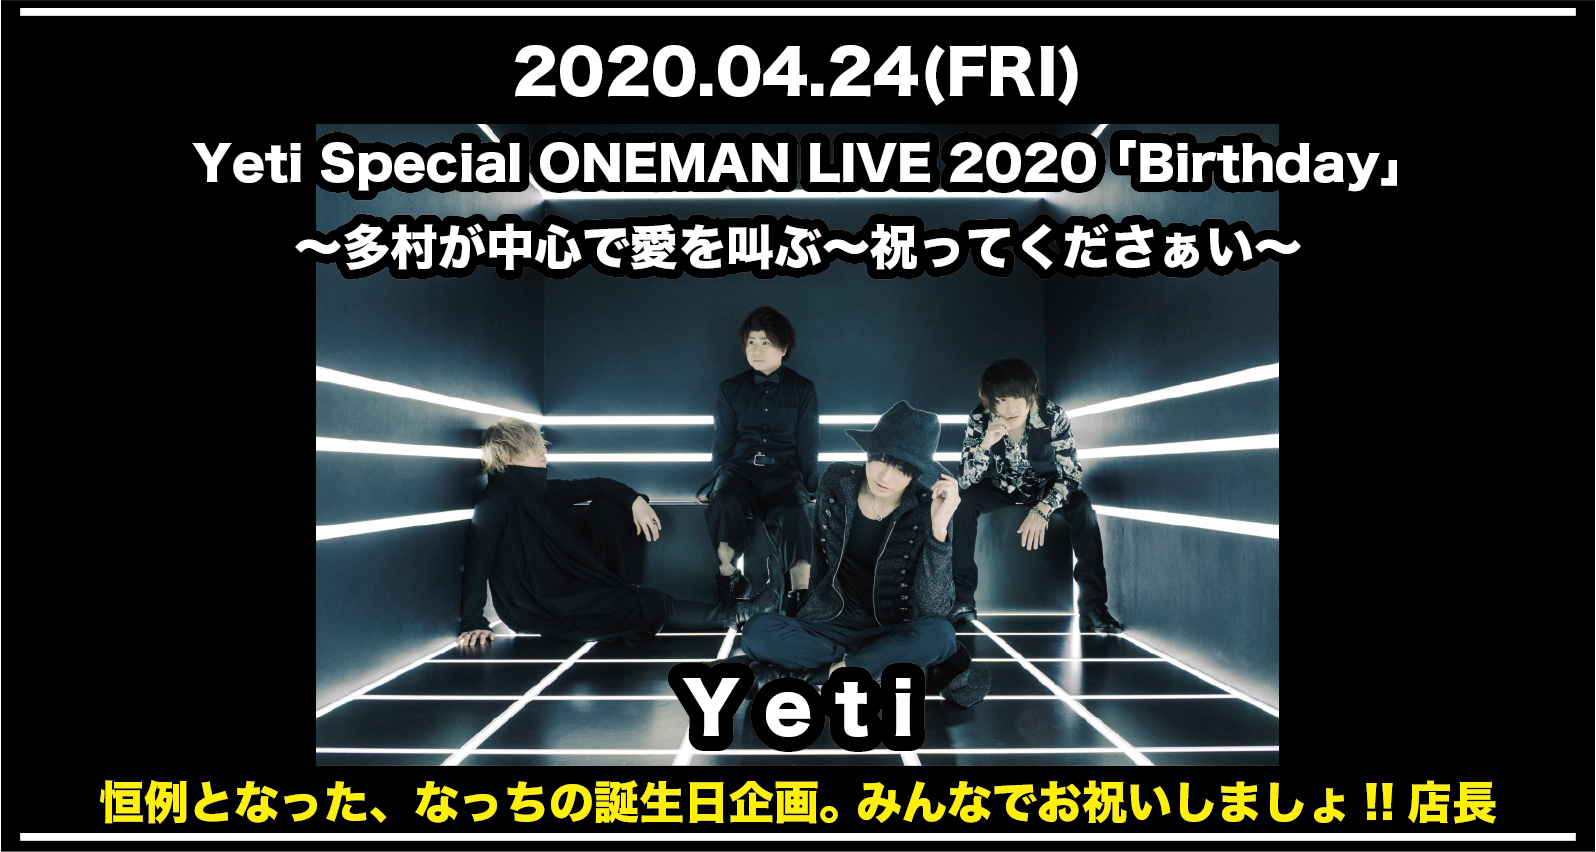 Yeti Special ONEMAN LIVE 2020 「Birthday」 〜多村が中心で愛を叫ぶ〜祝ってくださぁい〜